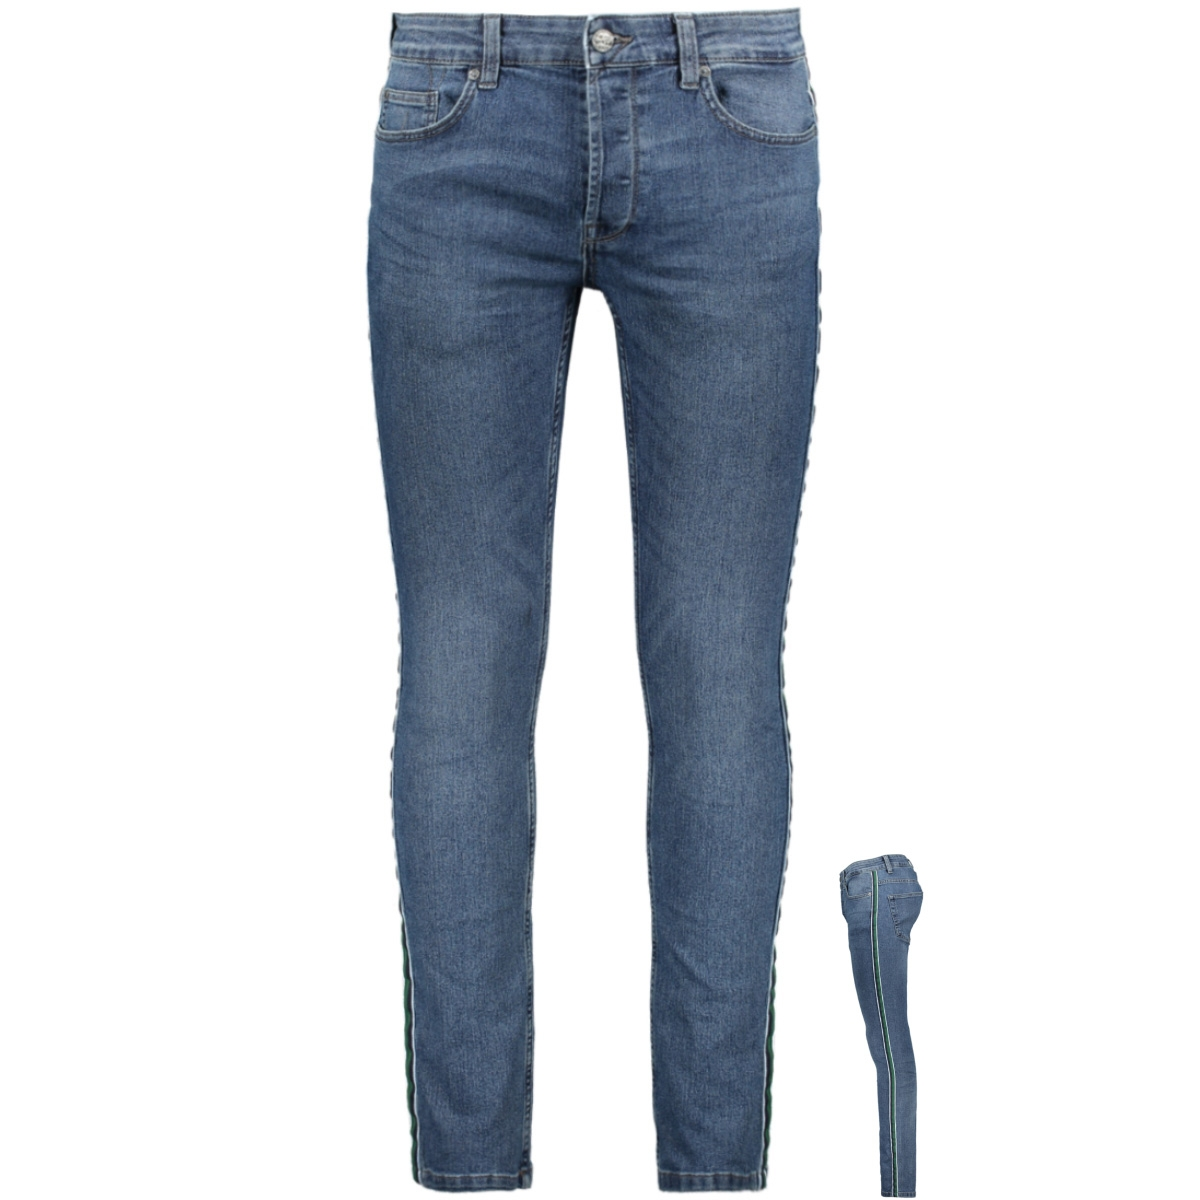 onsloom slim tape blue pk 5416 22015416 only & sons jeans blue denim